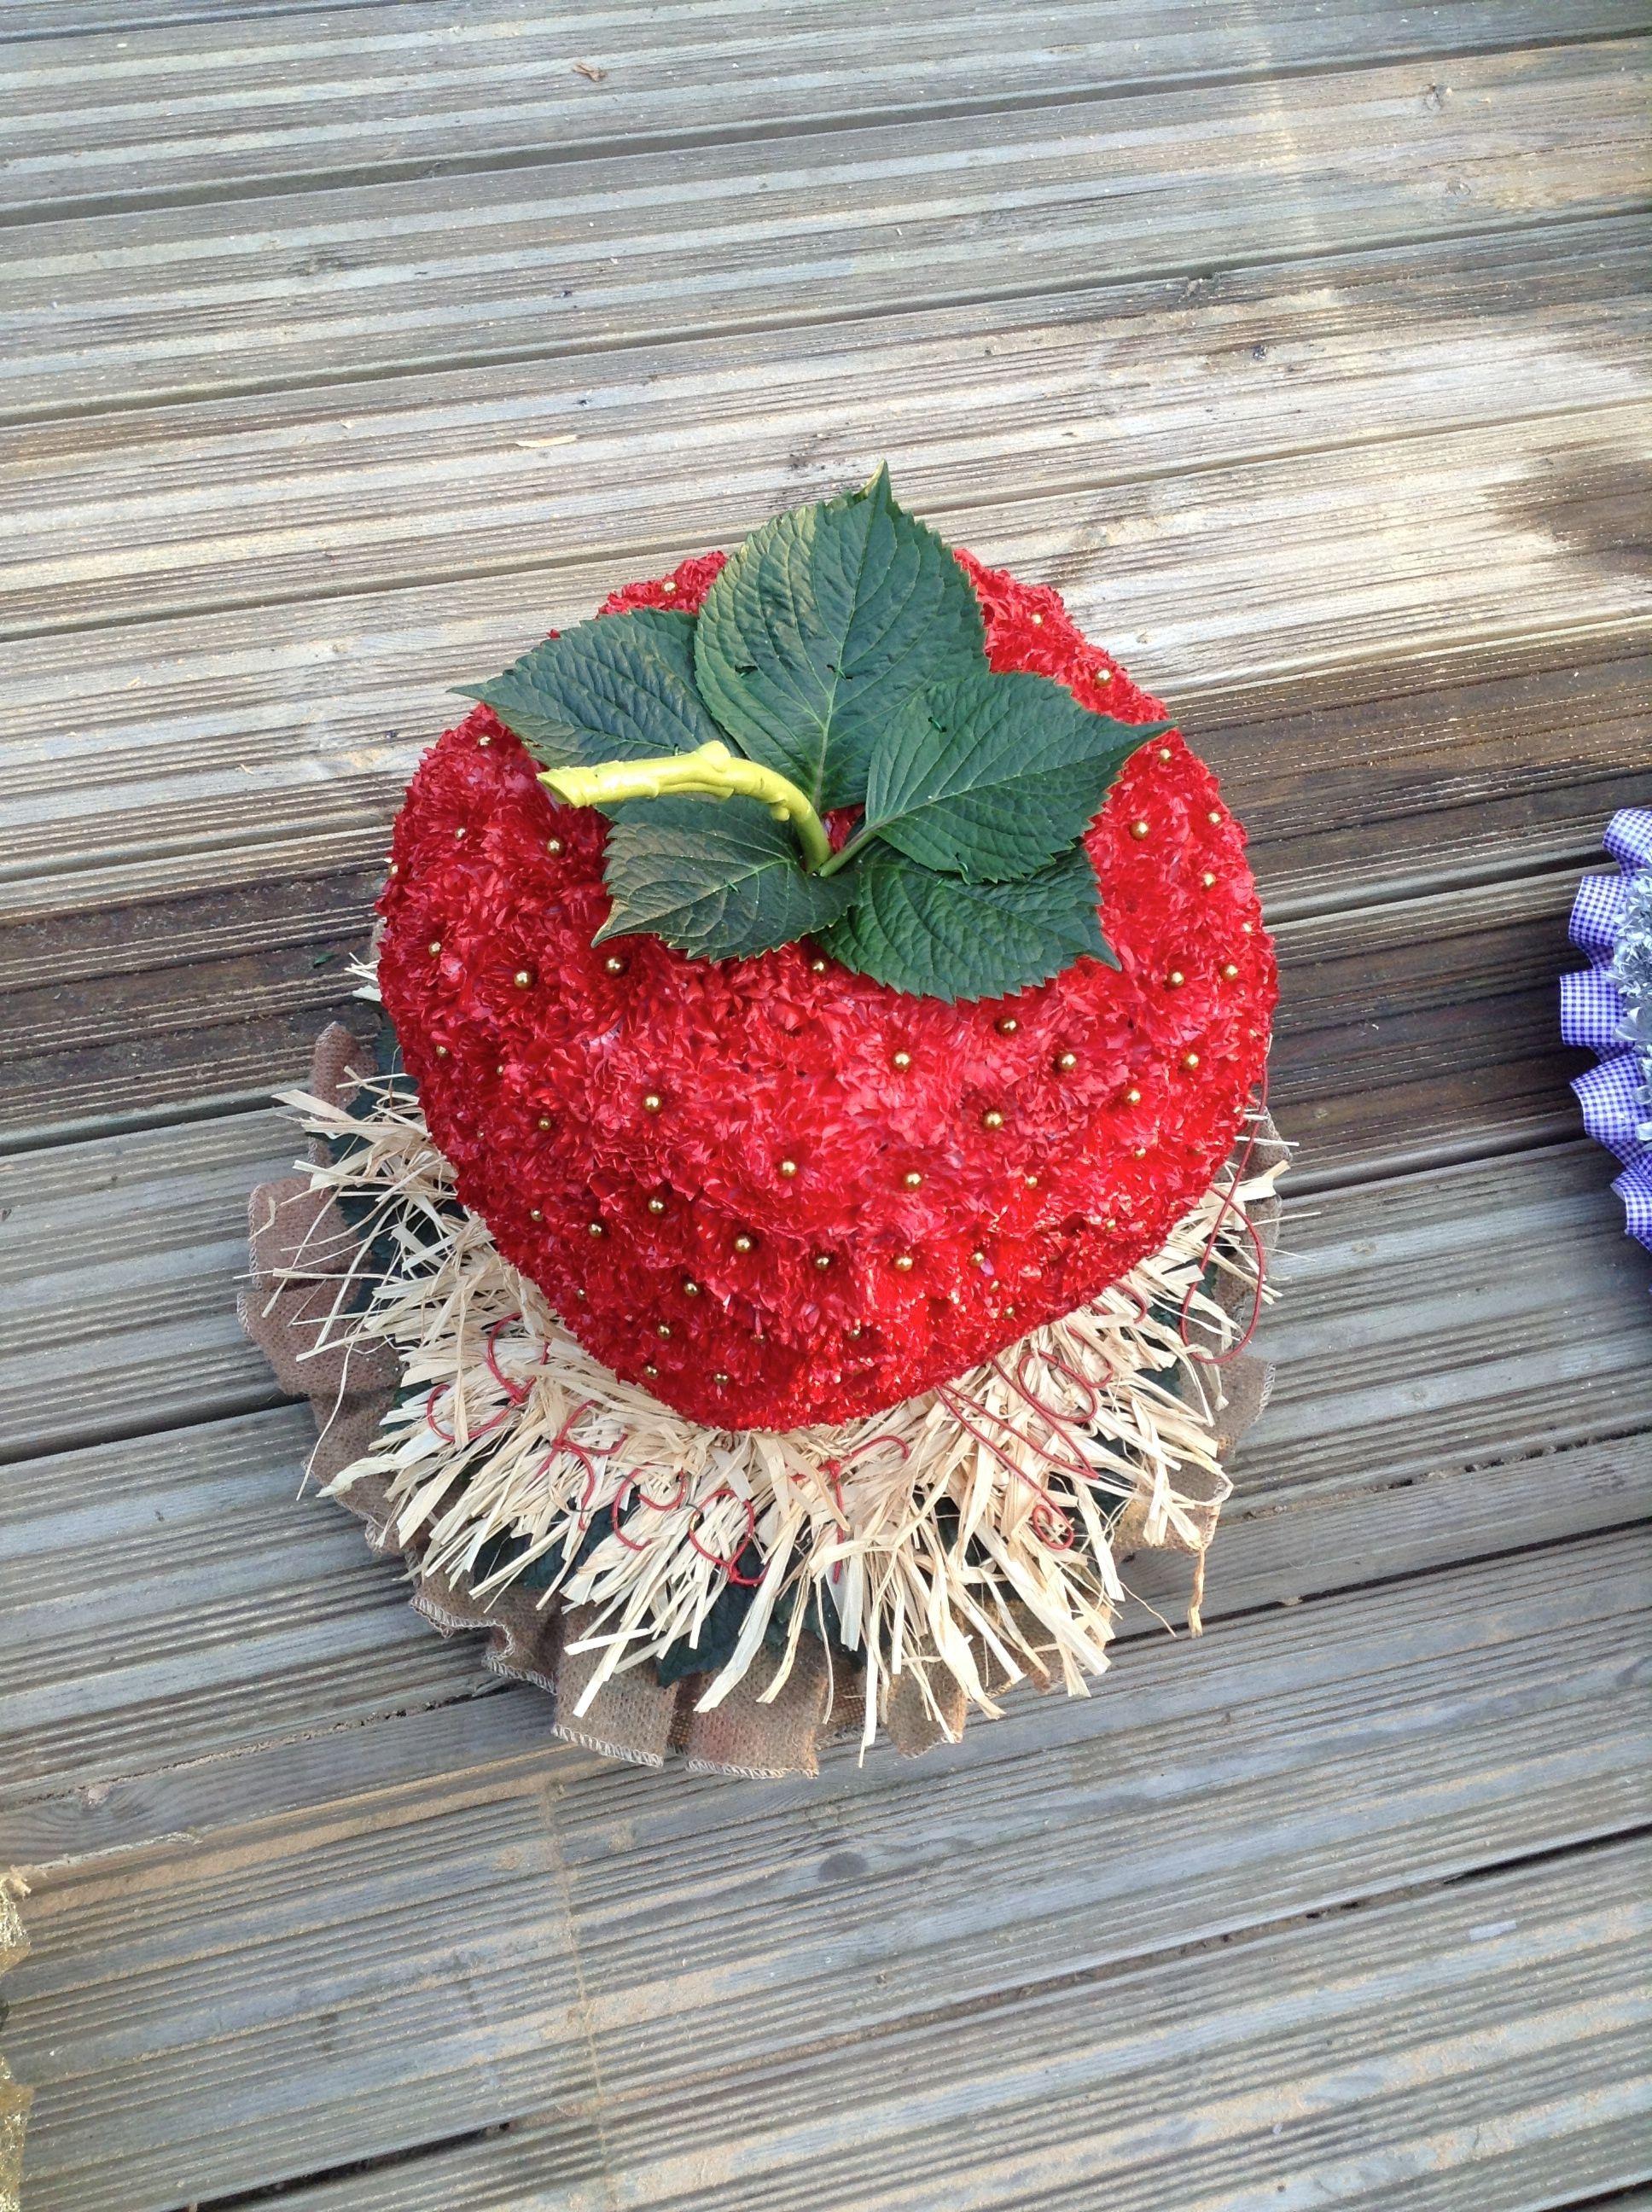 Strawberry funeral flowers tribute, bespoke funeral flower